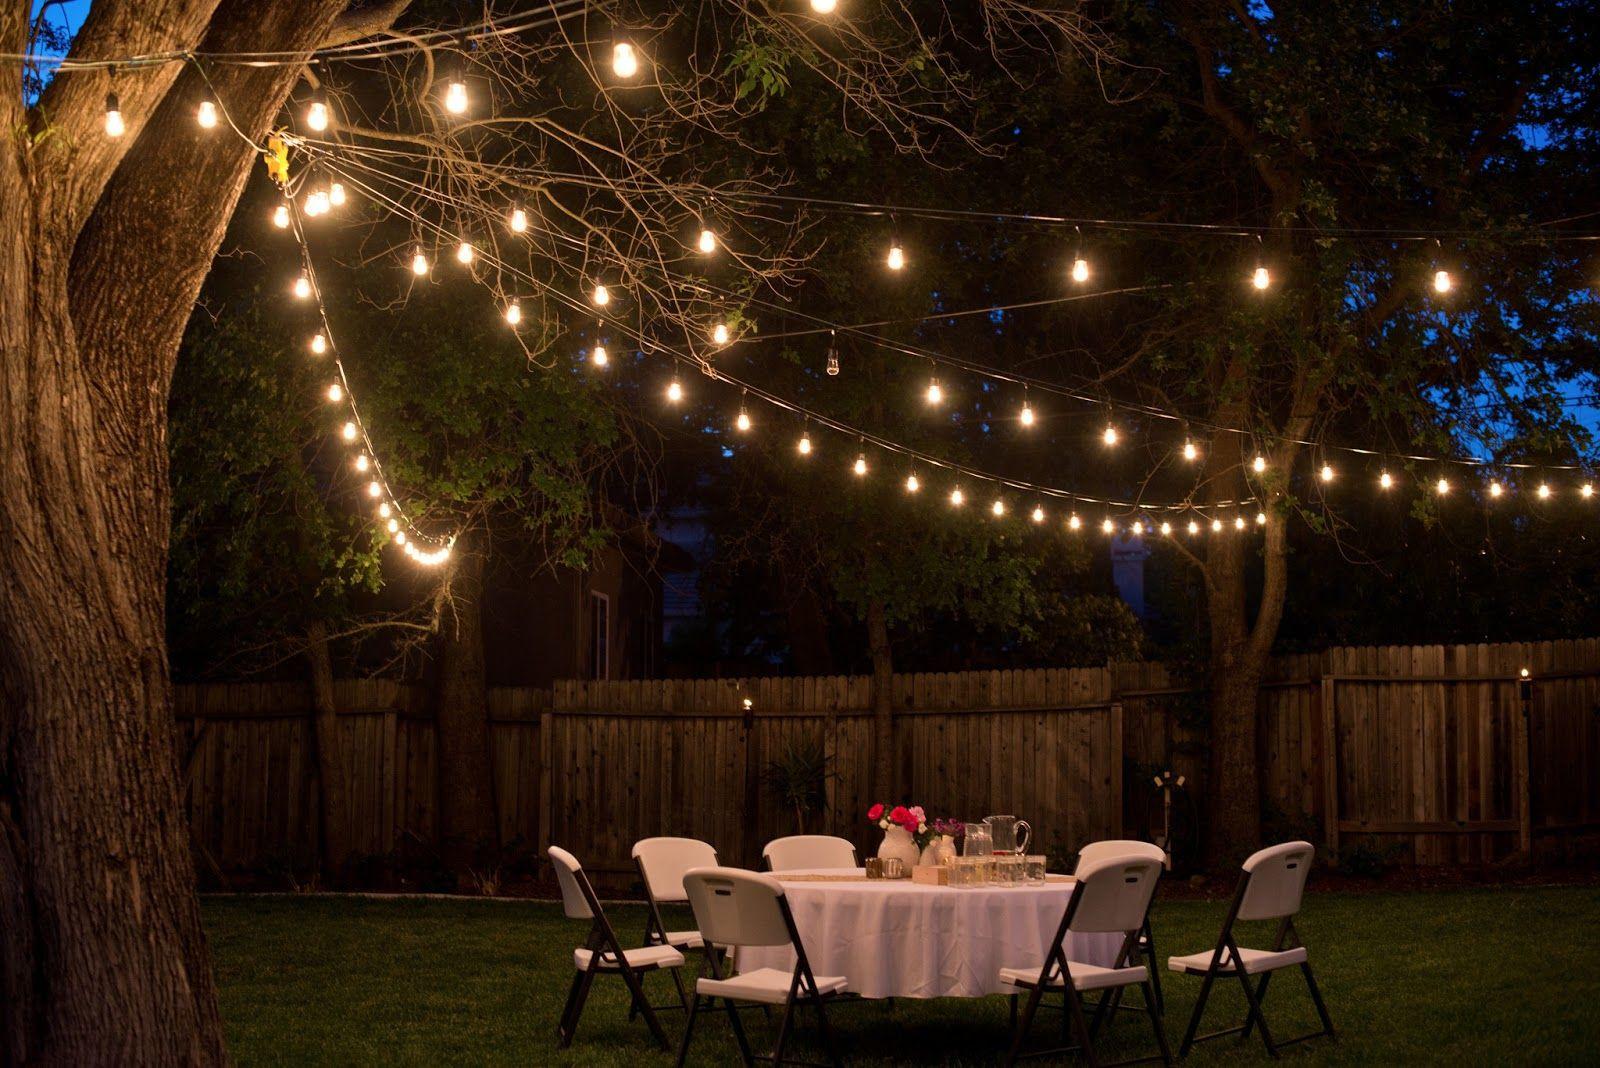 Lighting Ideas For Backyard Party  backyard lights Google Search City Scenes